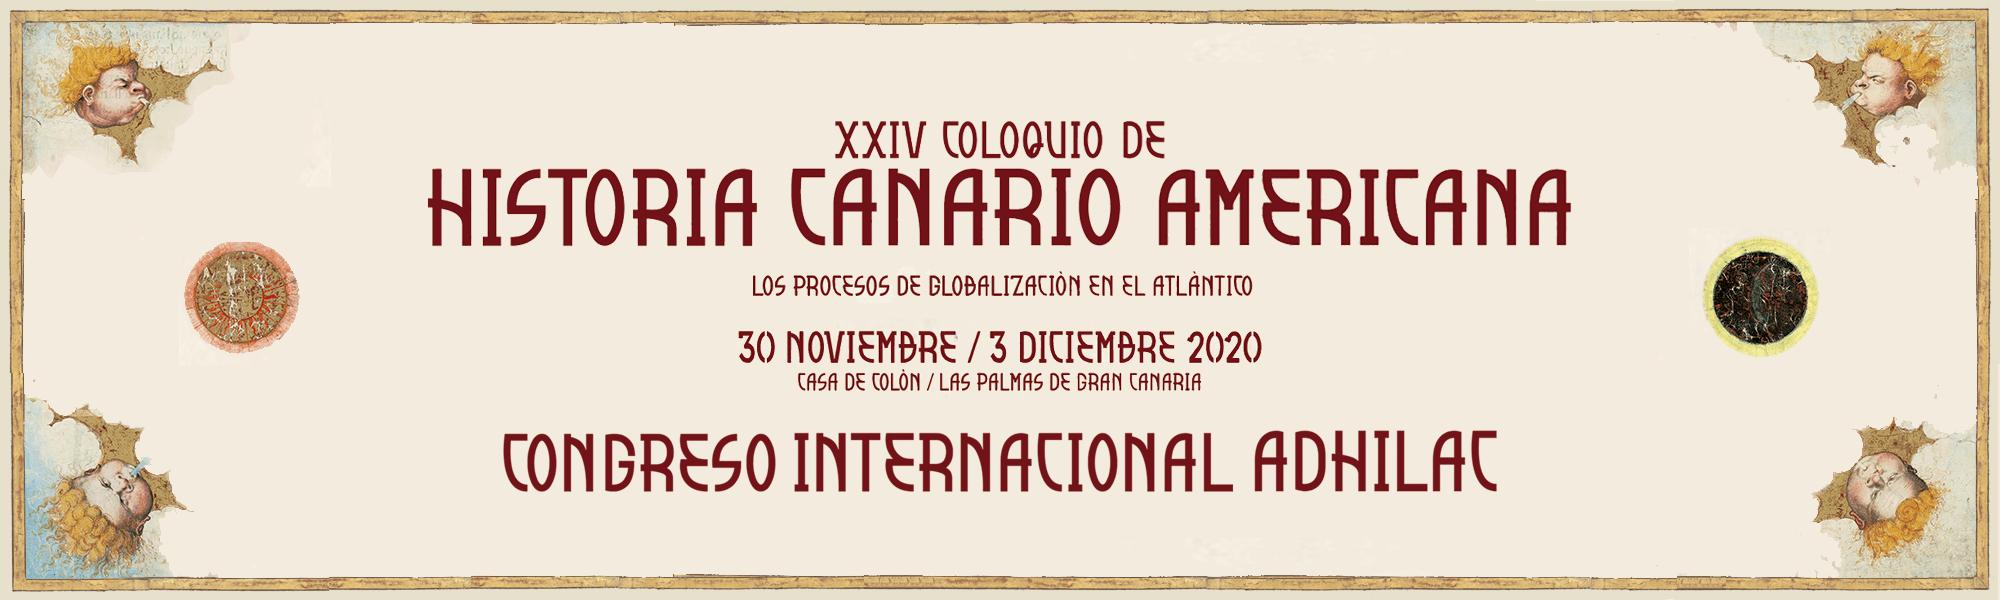 Cabecera del XXIV Coloquios de Historia Canario Americana